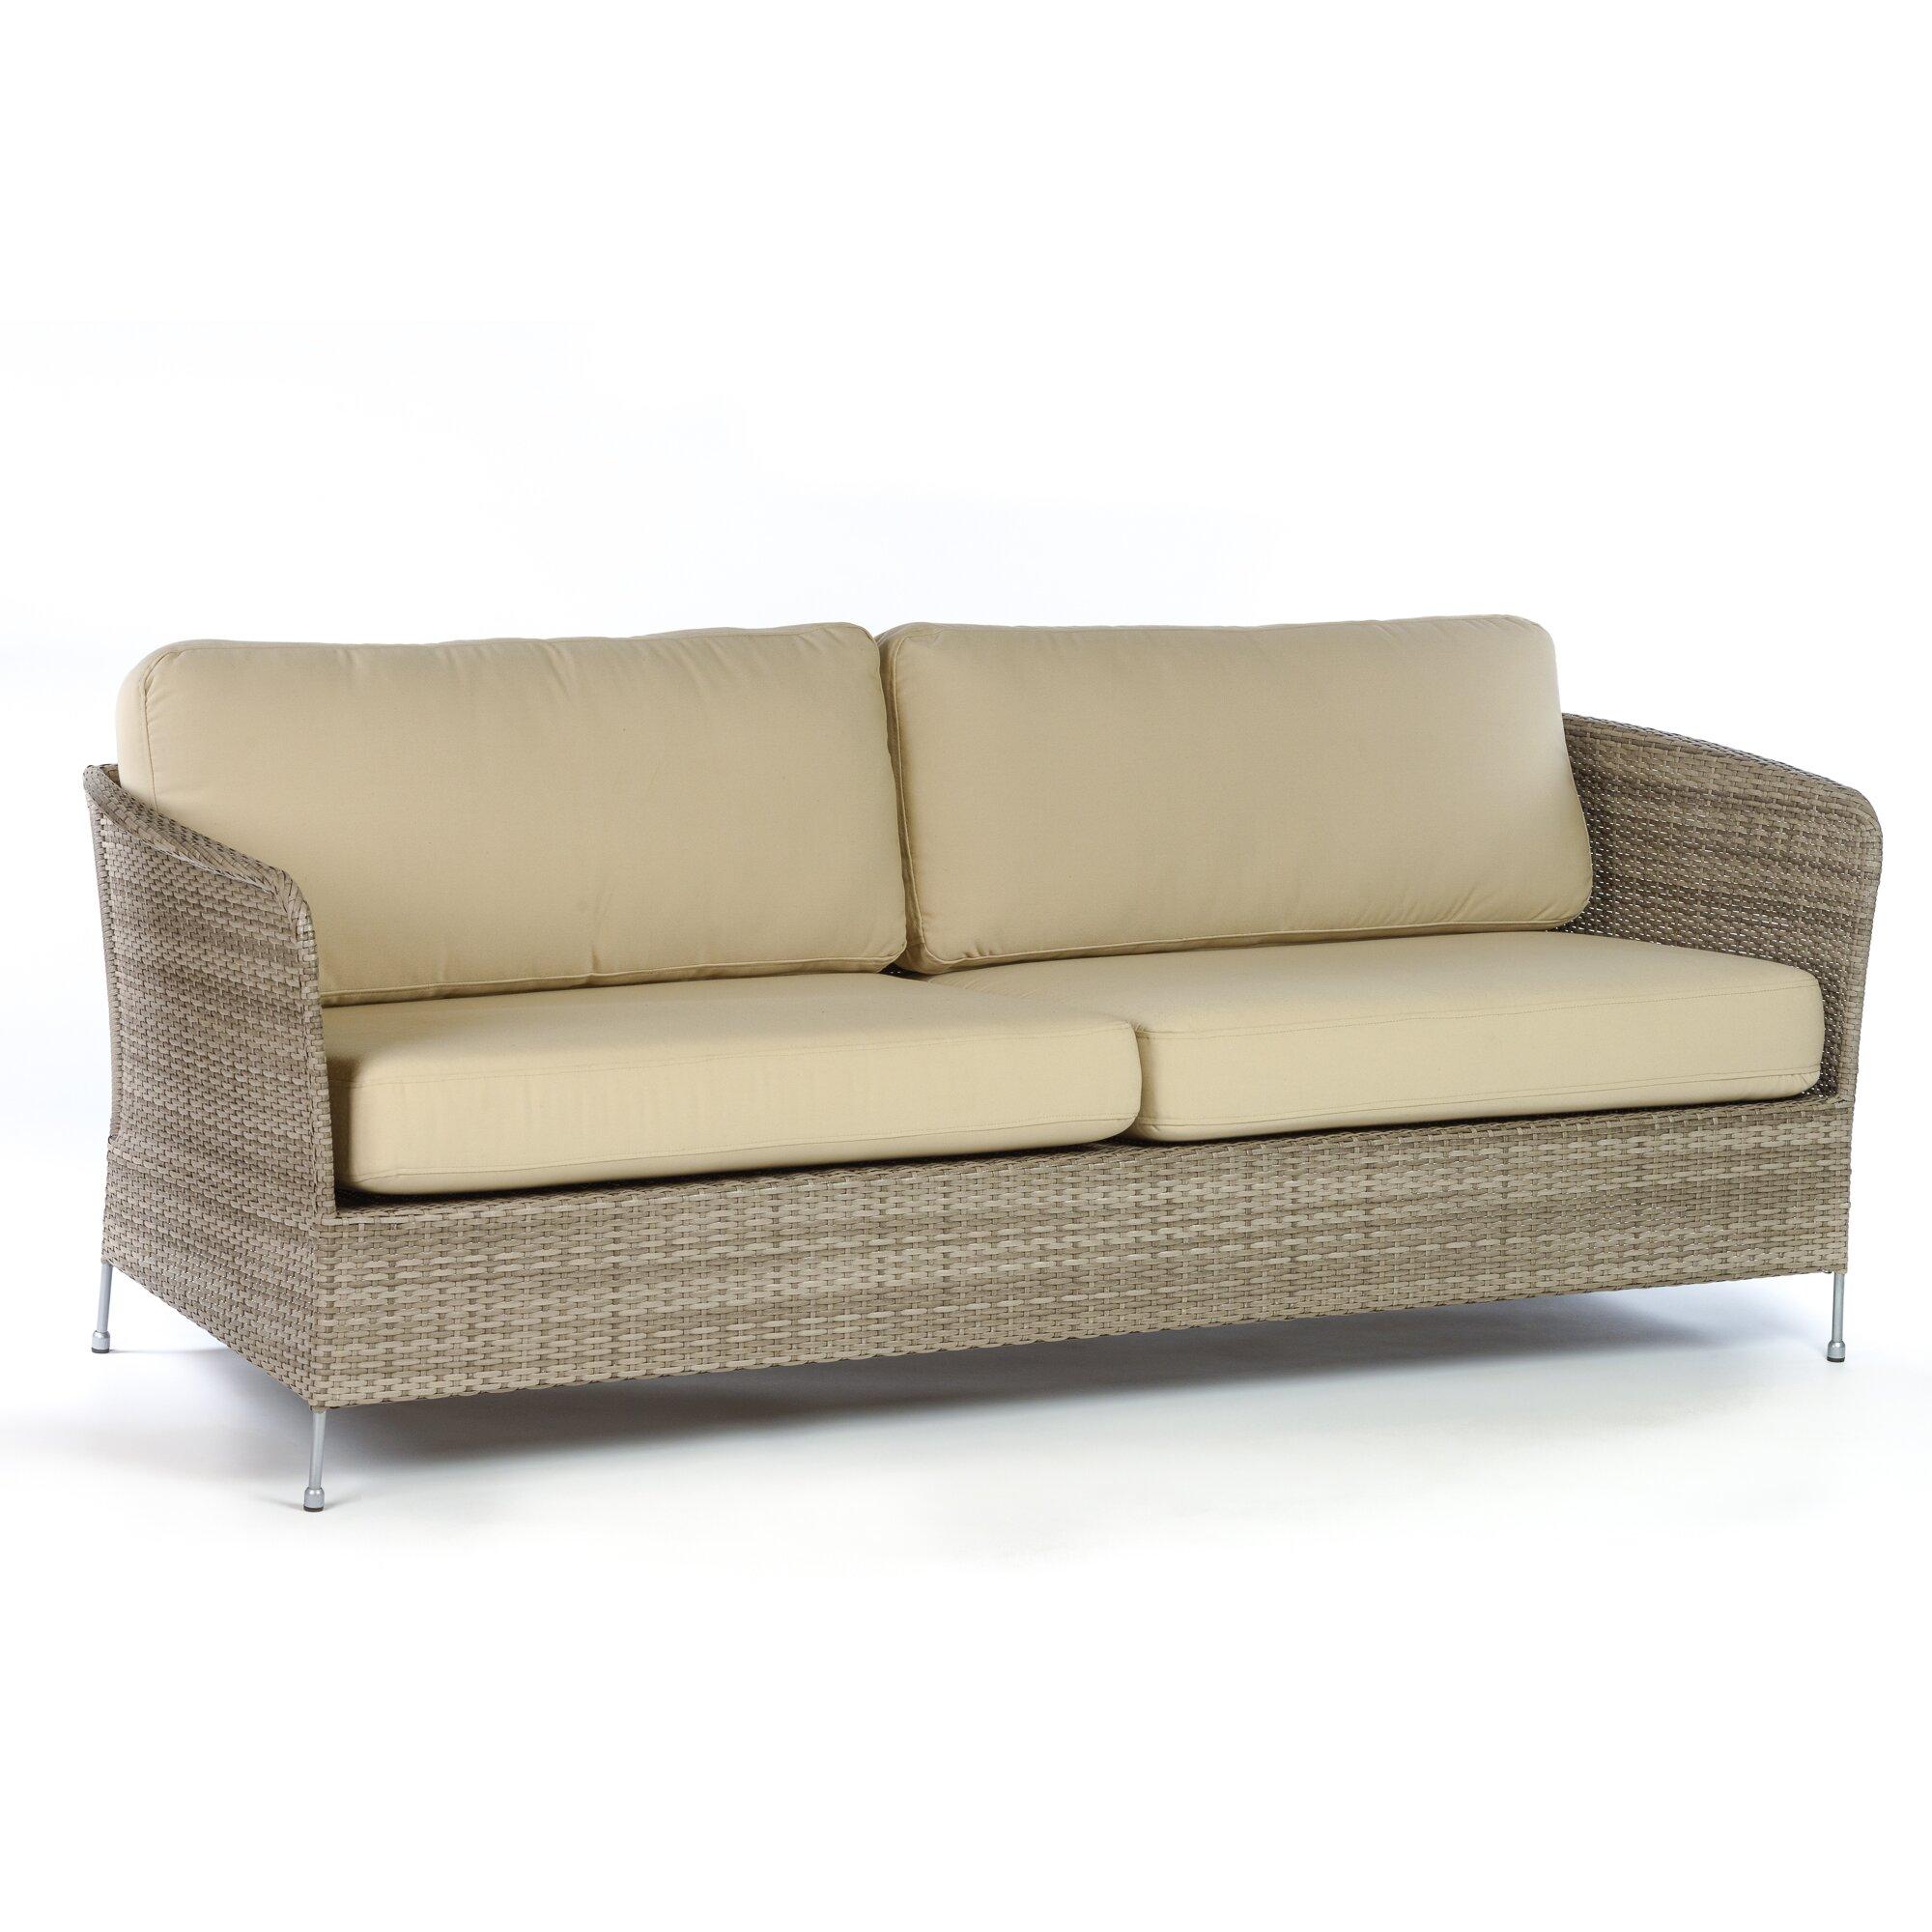 Co9 design addison sofa with cushions reviews wayfair for Sofa 1 80 breit